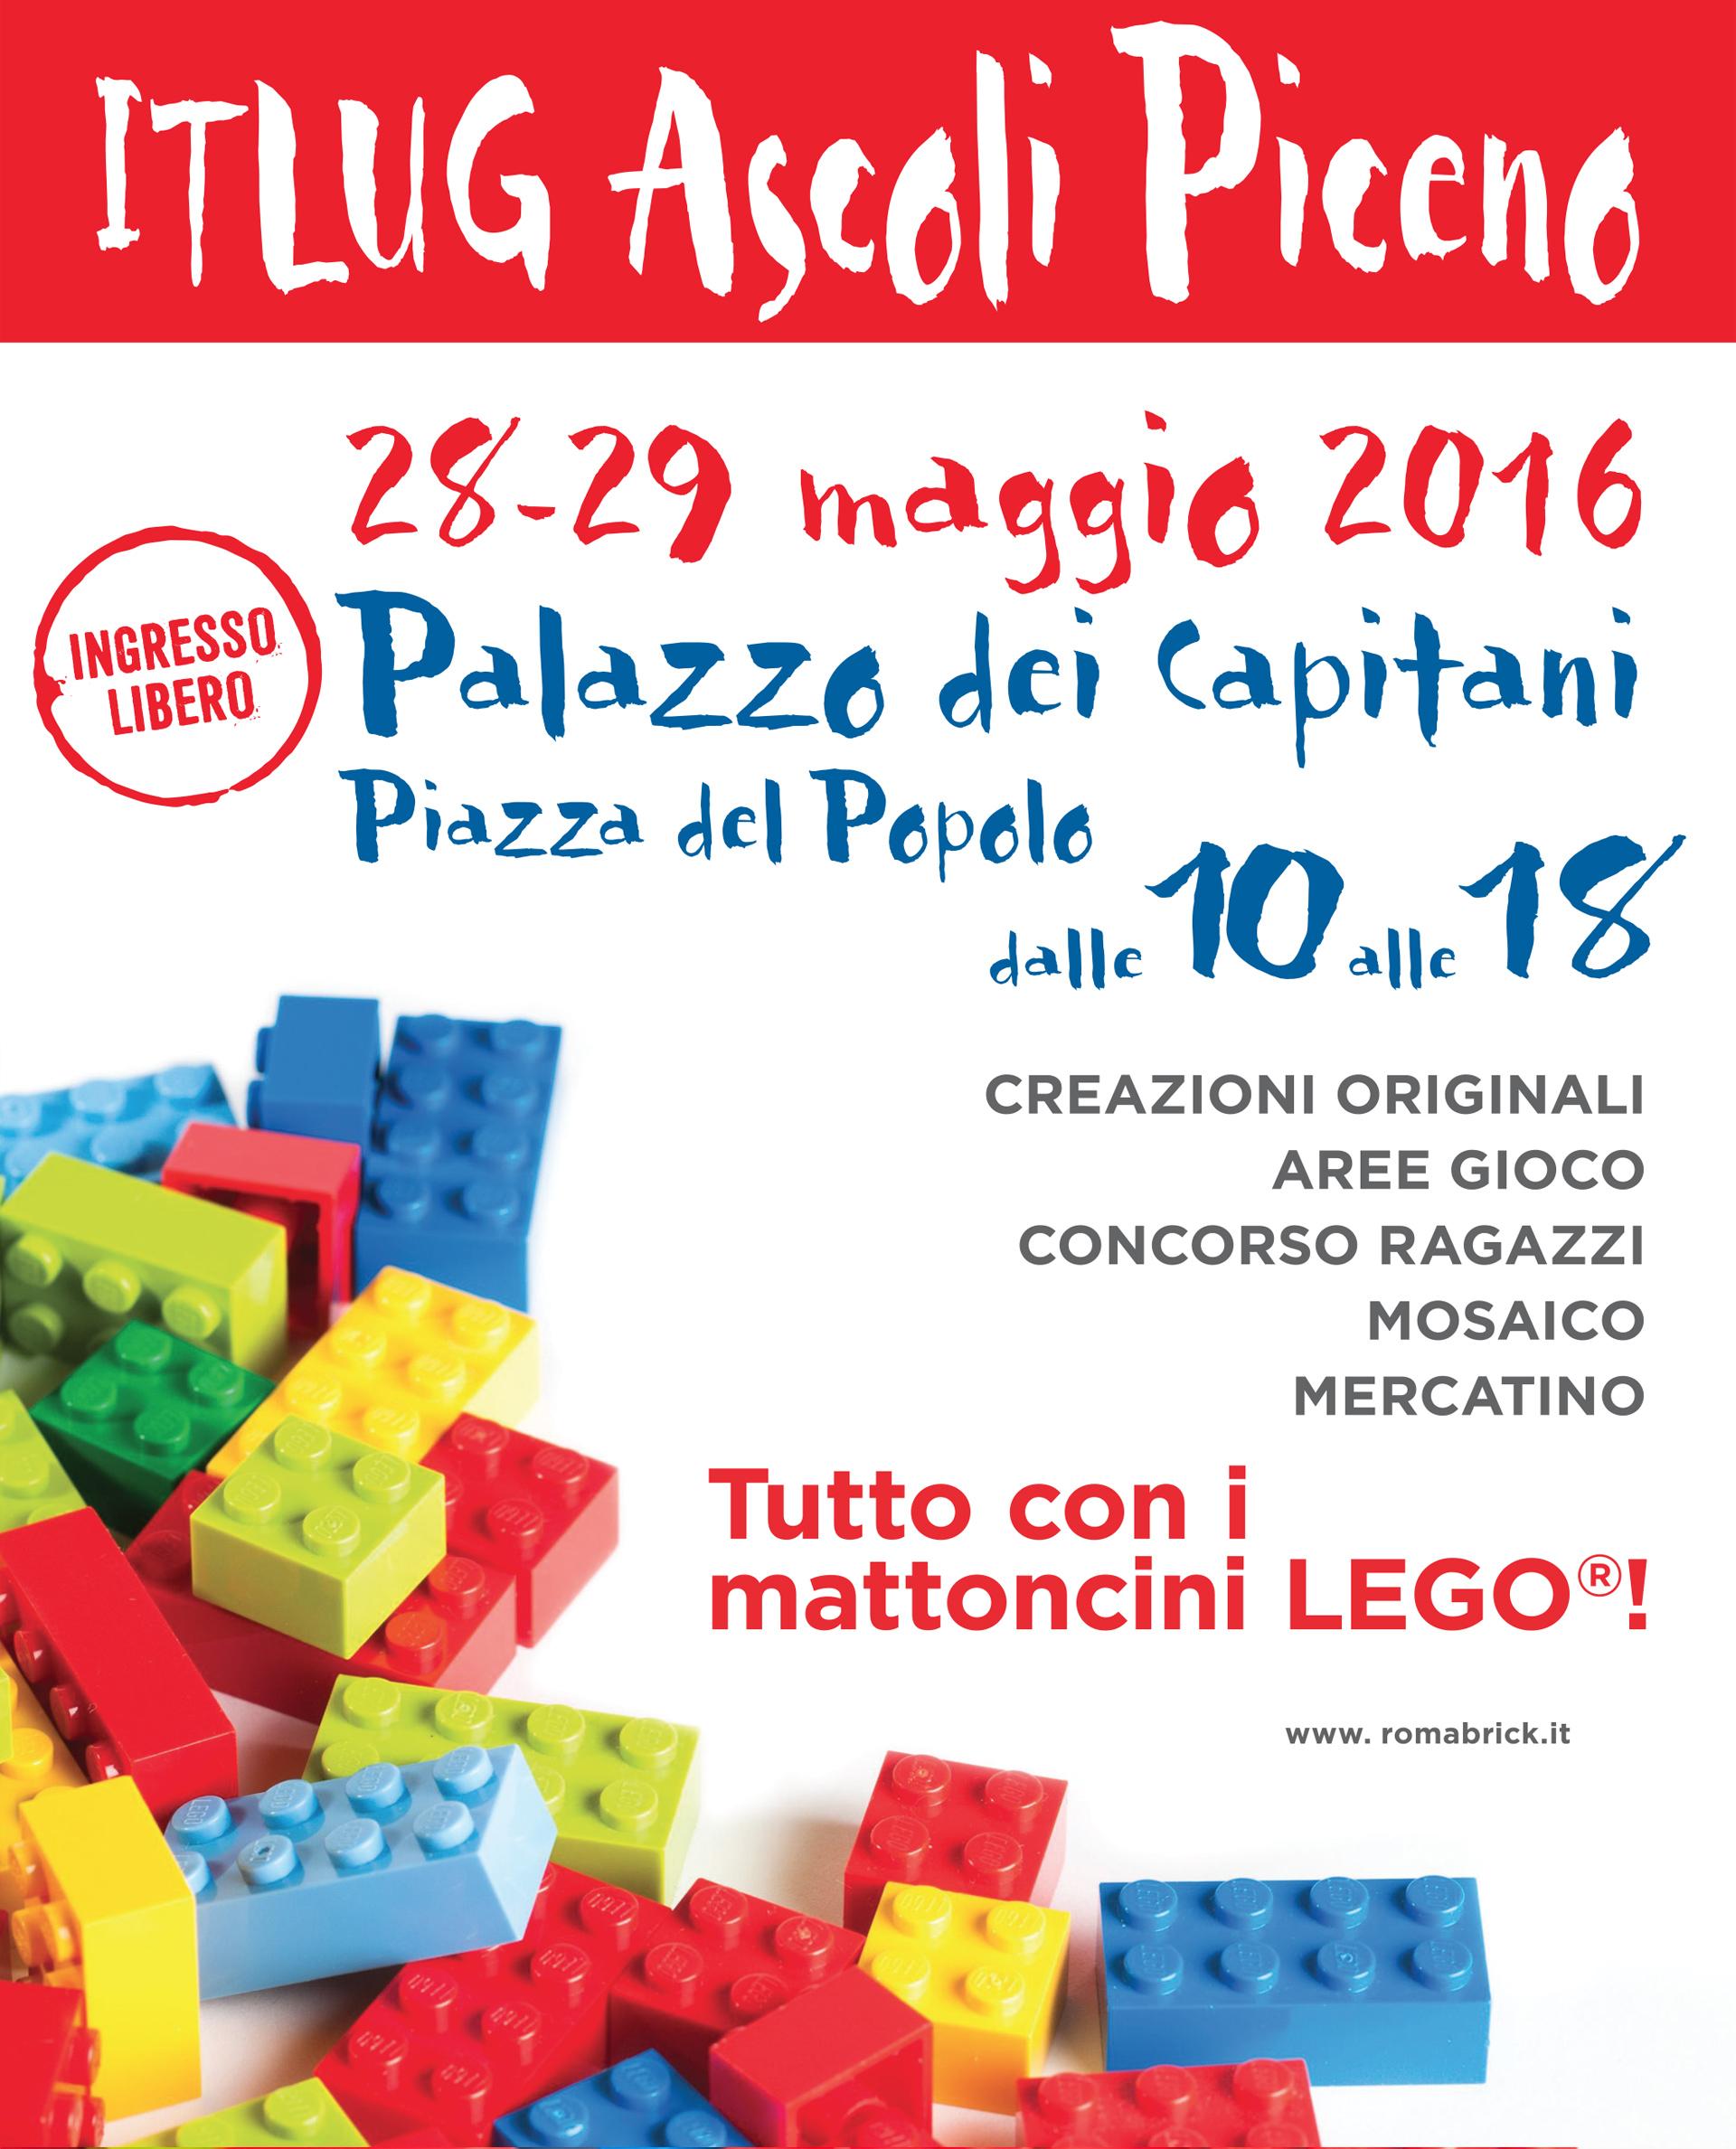 ItLUG Ascoli Piceno 2016